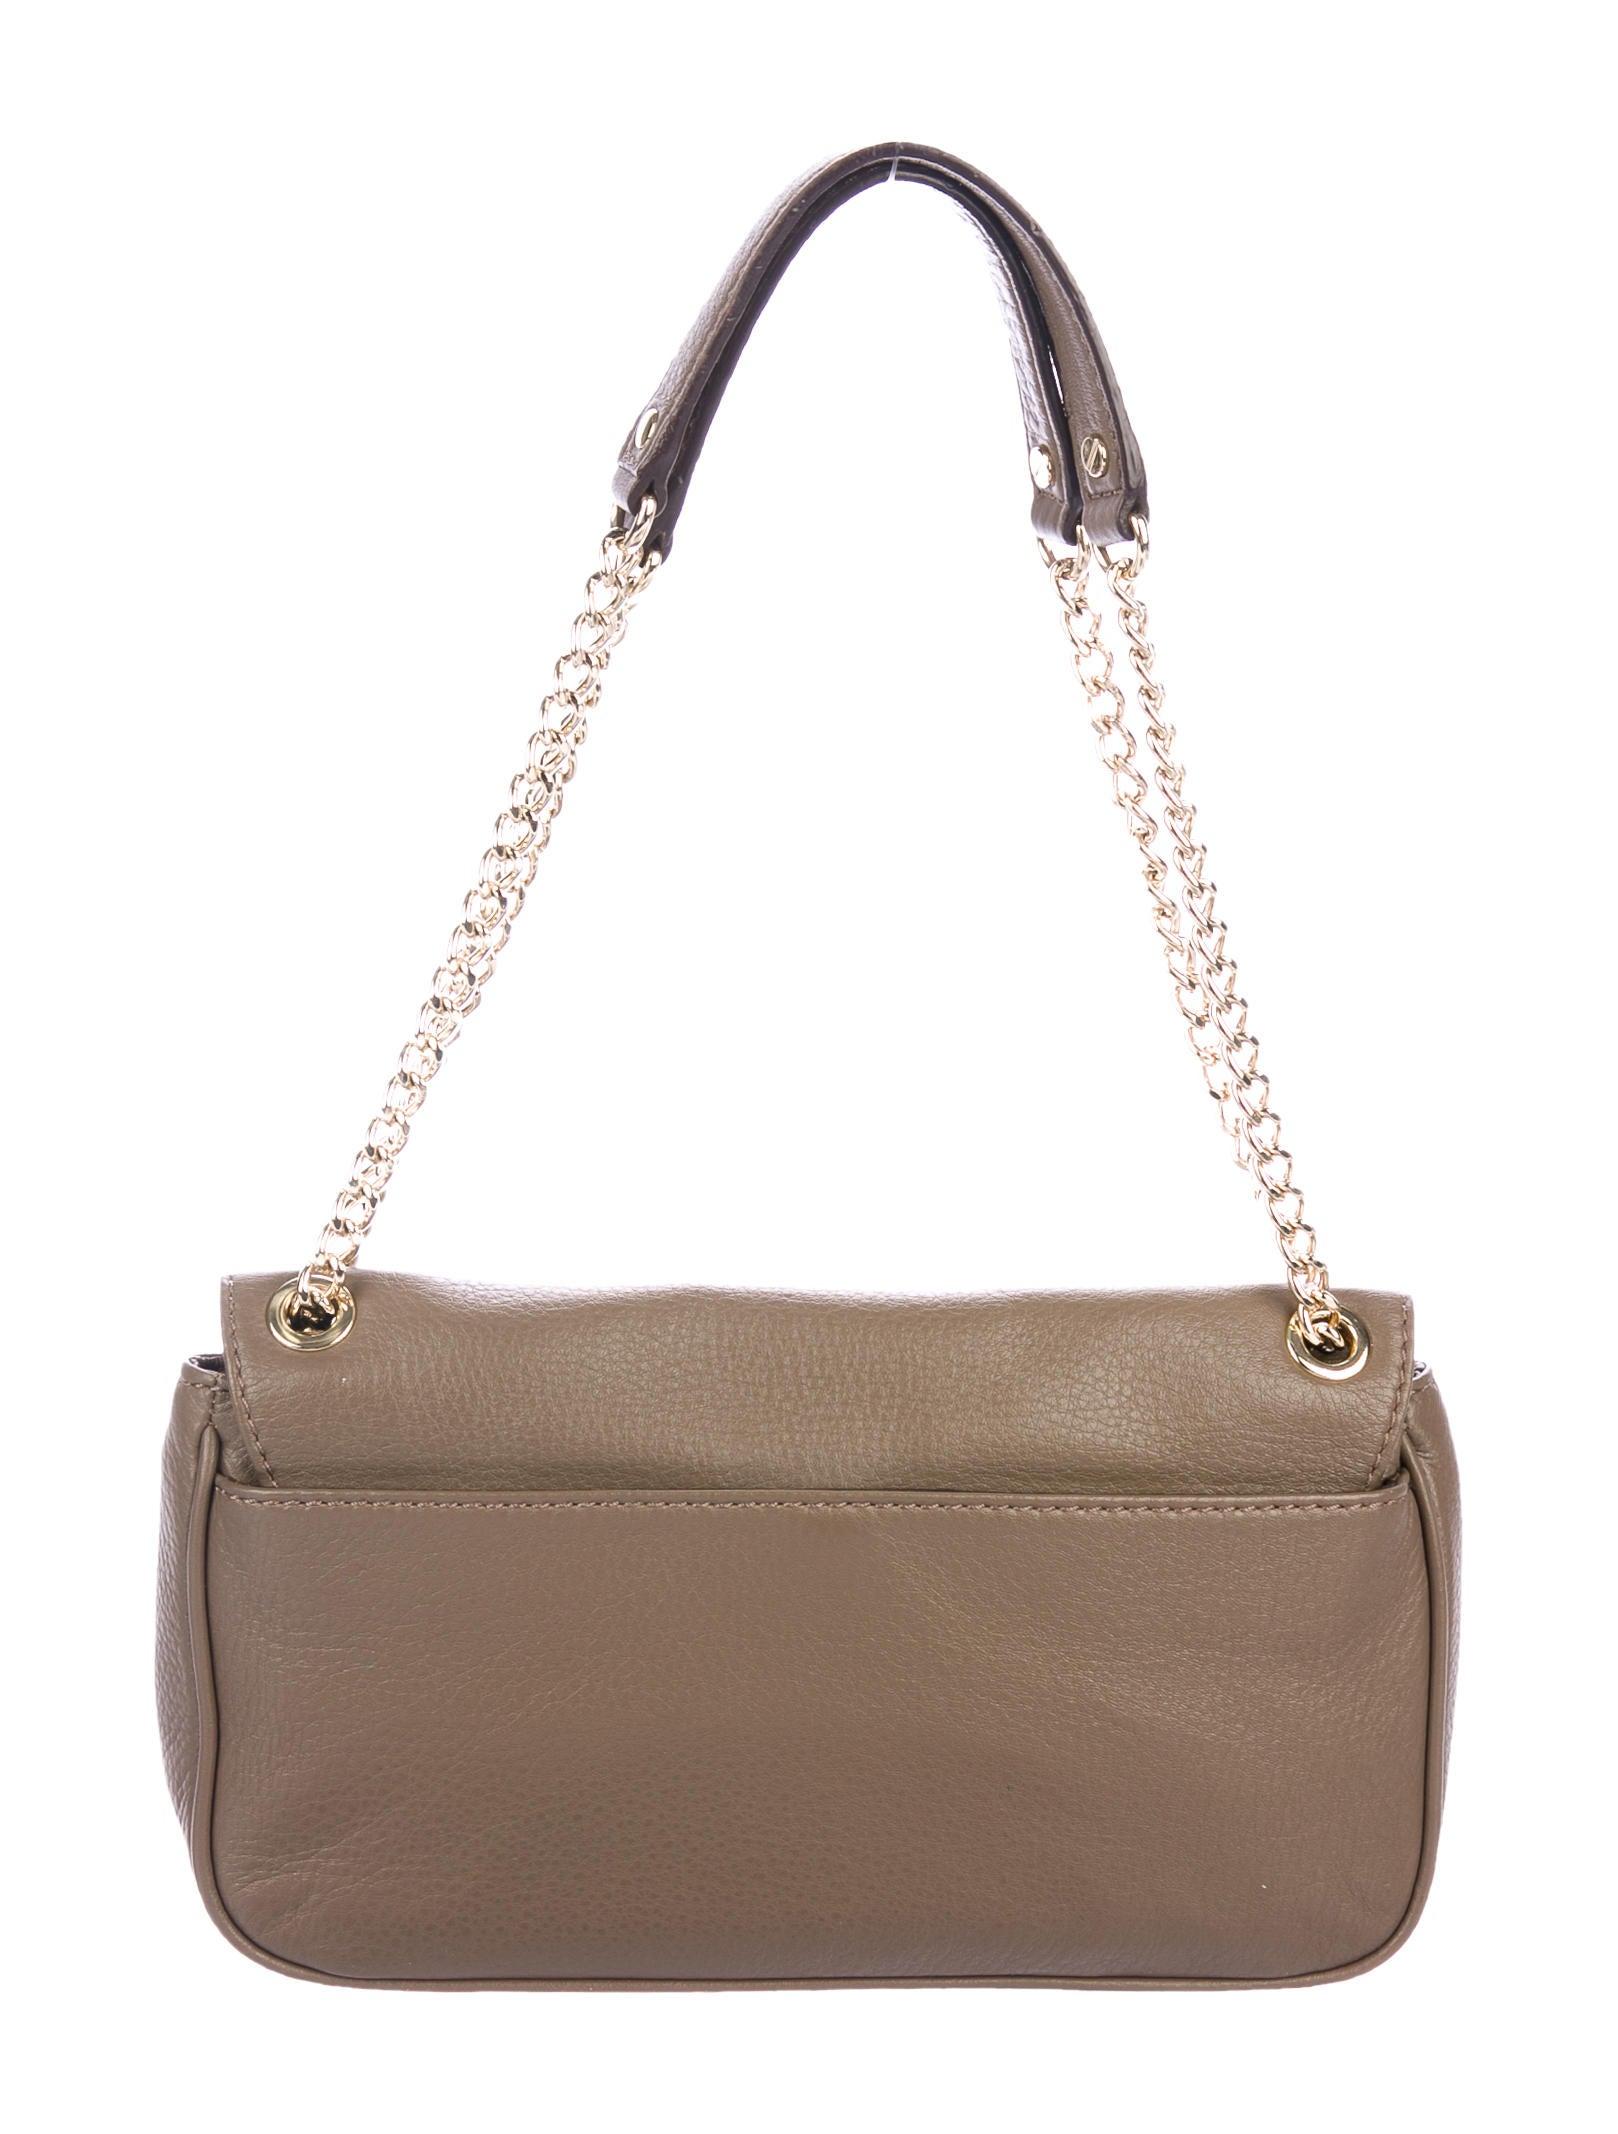 09a25f2c14 Michael Michael Kors Logo Flap Leather Shoulder Bag - Handbags ...